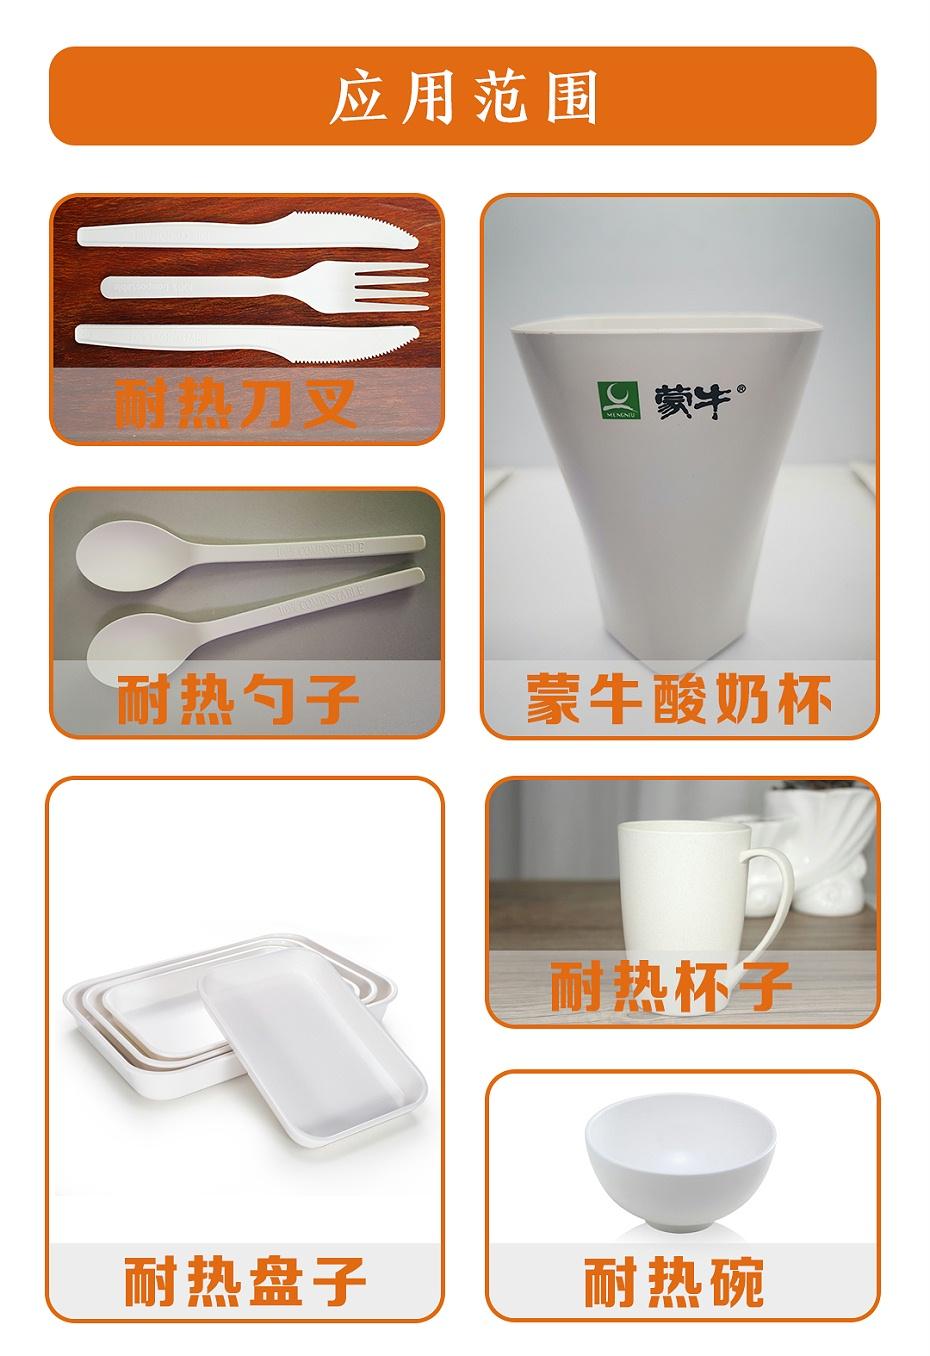 pla耐热制品,PLA刀叉,PLA勺子,PLA杯子